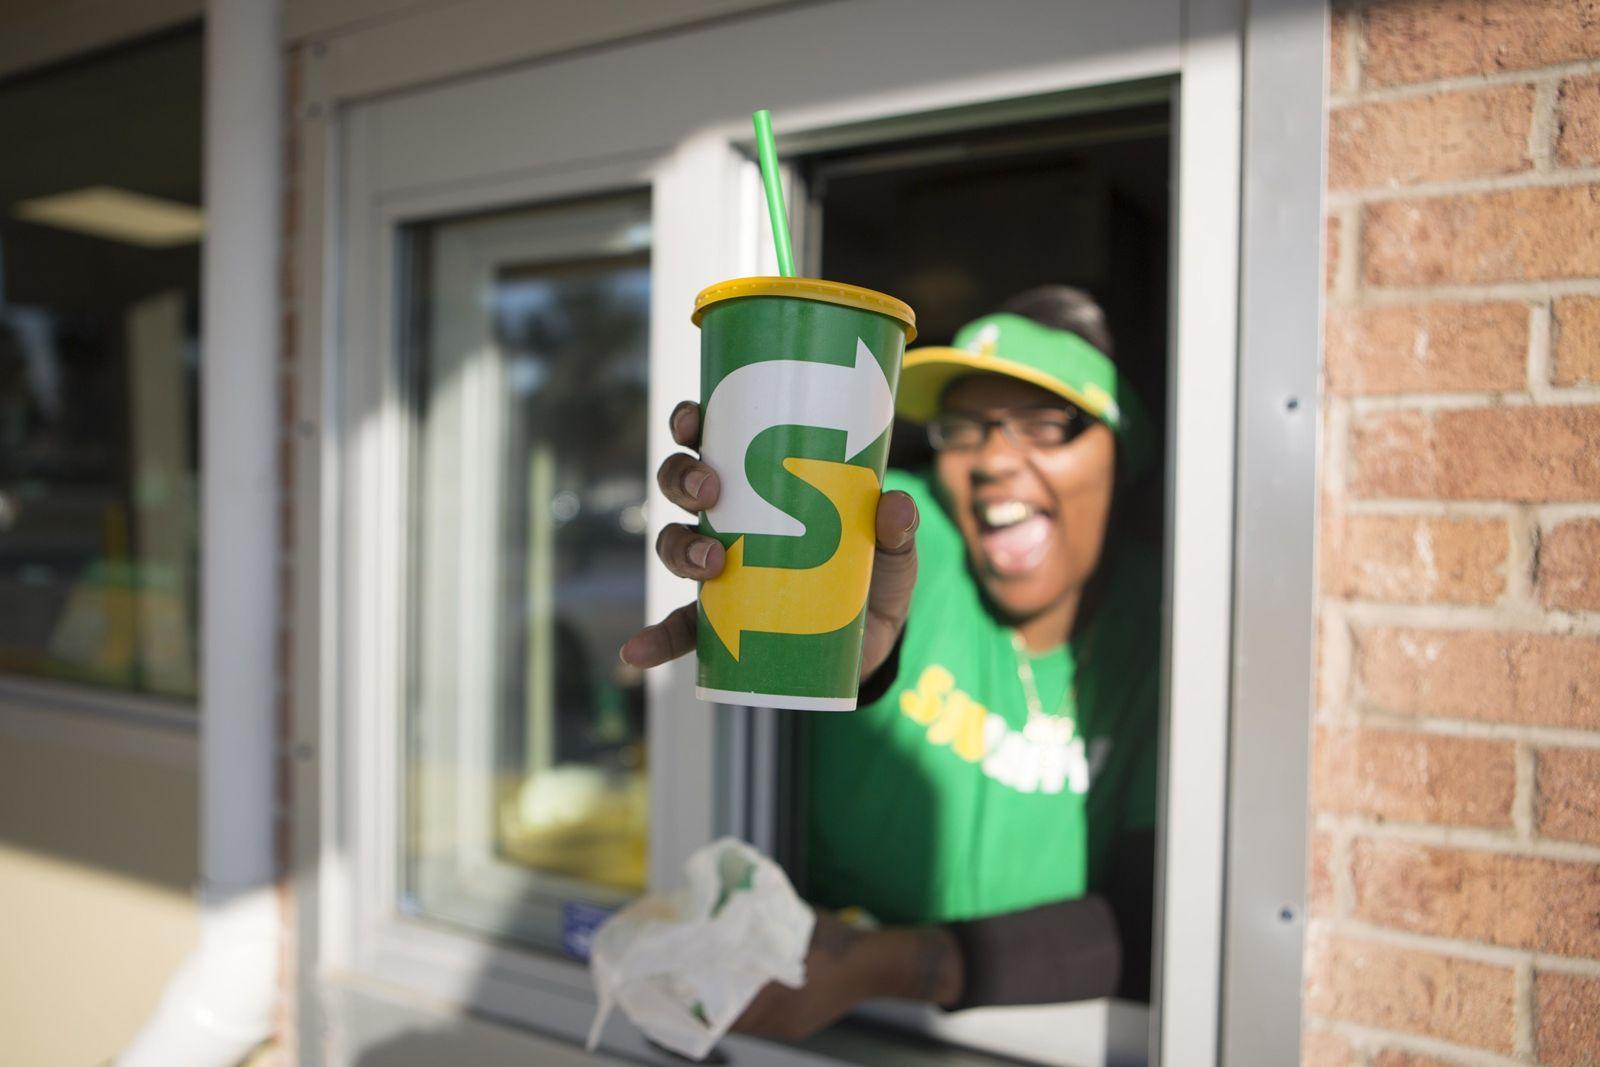 Subway Restaurants to Add 50,000 Jobs in Communities Across North America